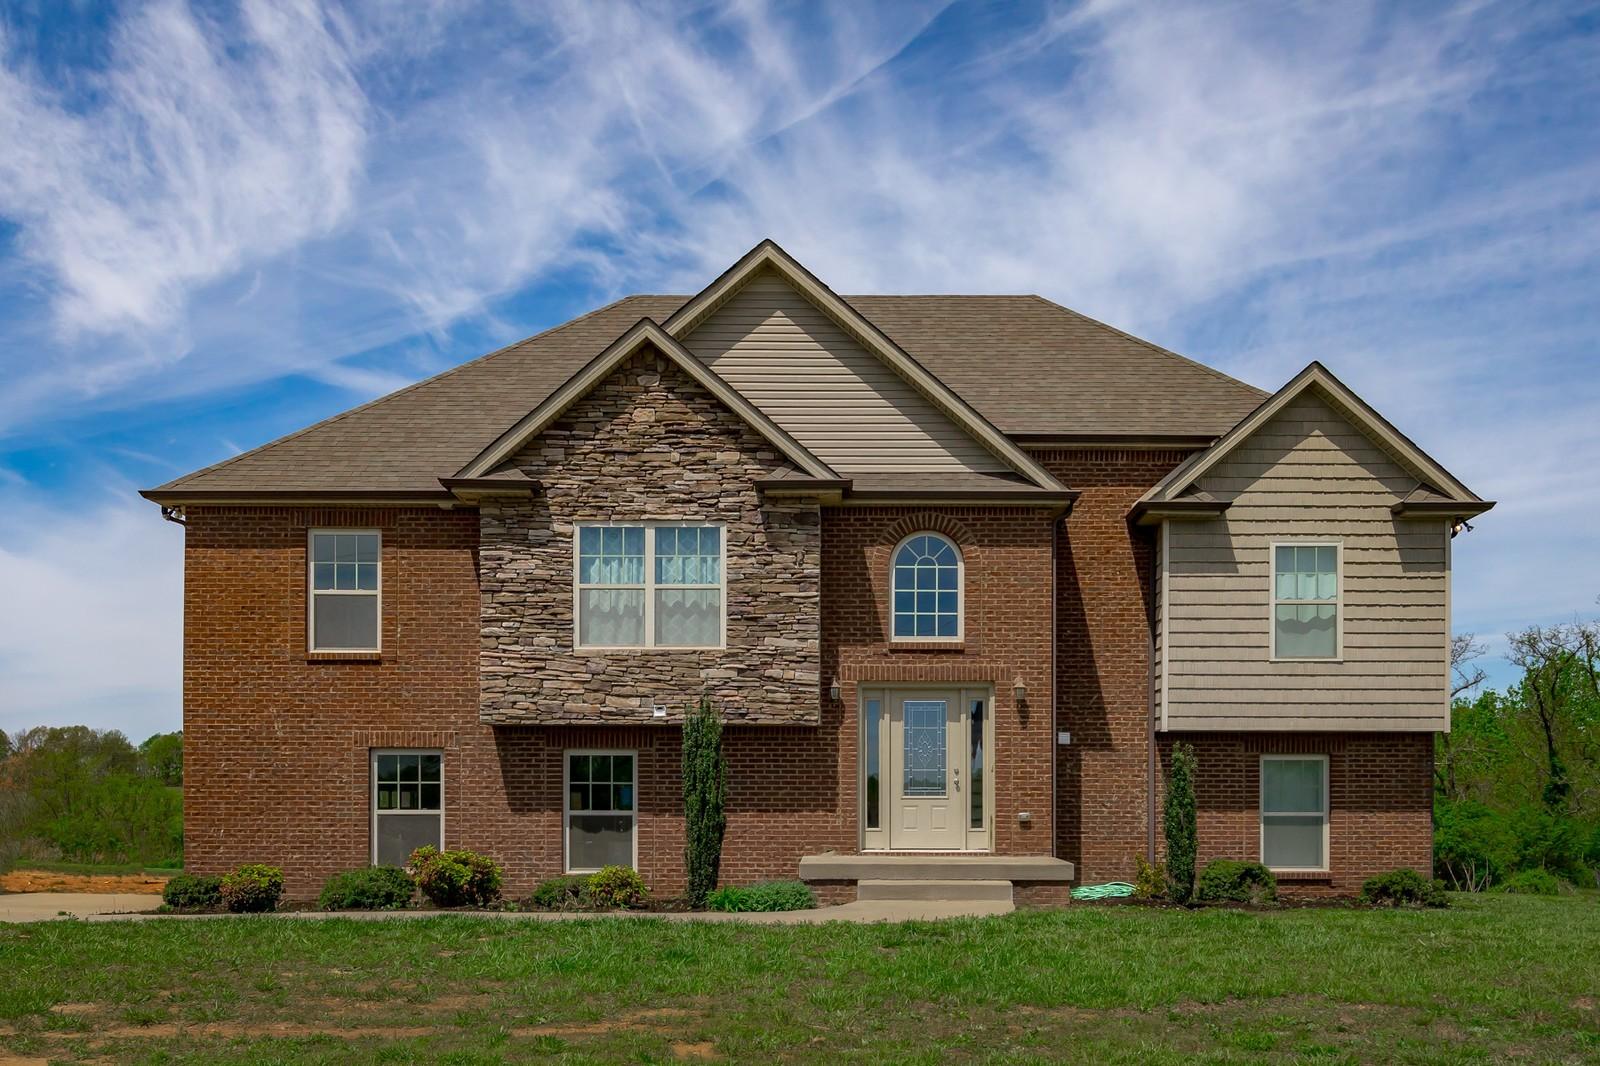 4130 Old Highway 48, Southside, TN 37171 - Southside, TN real estate listing